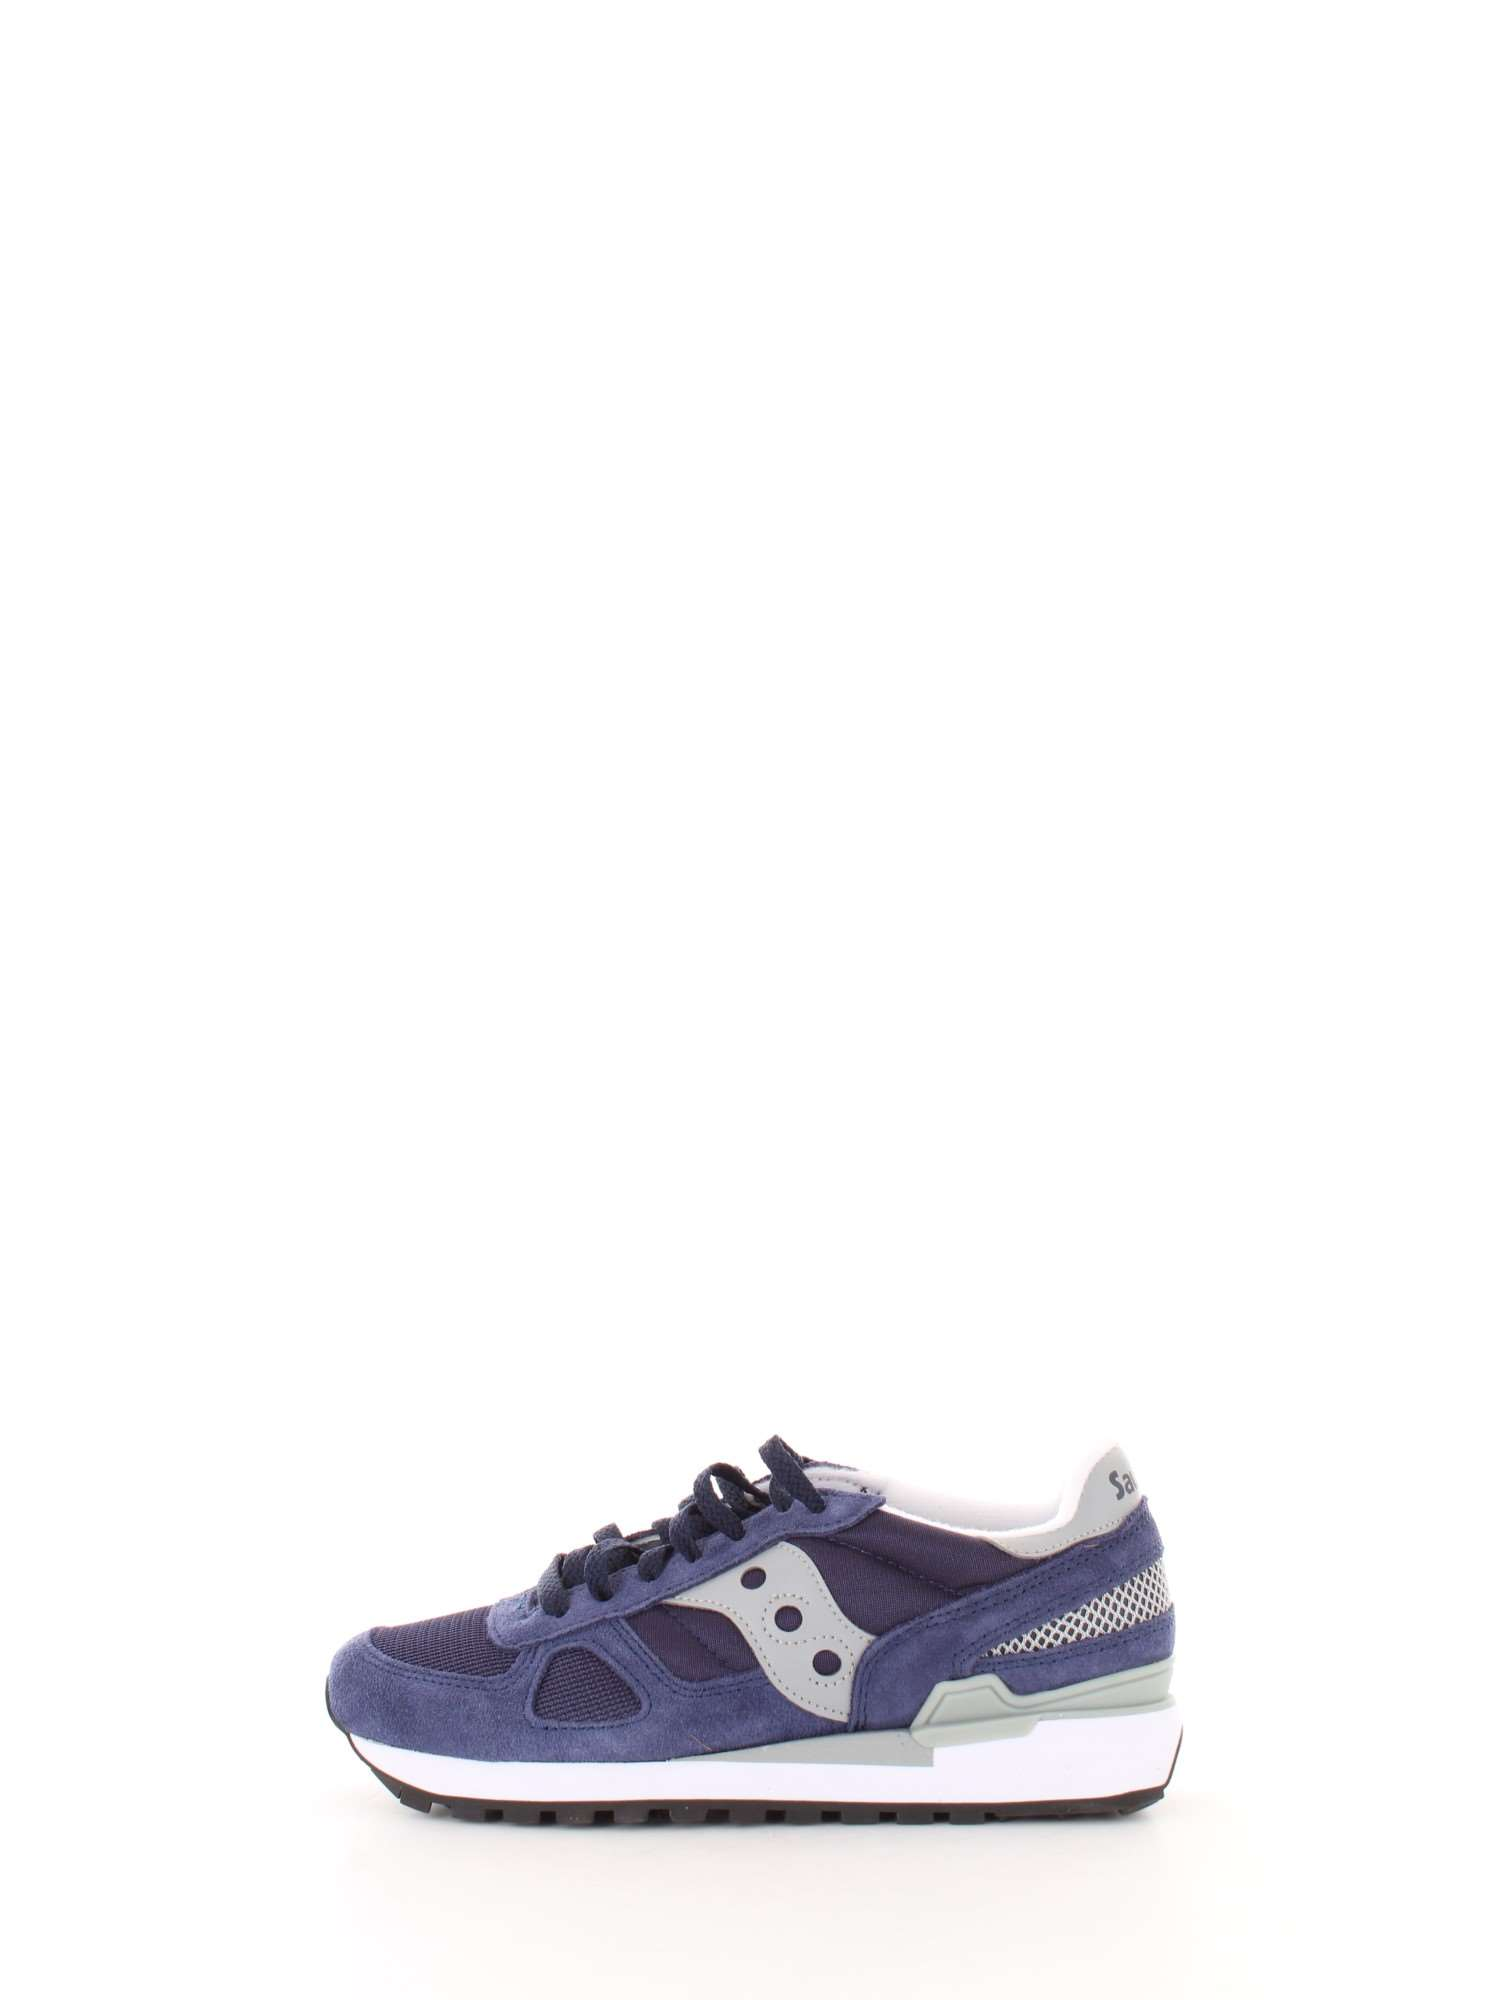 huge selection of 27feb 00885 Sneakers Shadow Blu Saucony estate 523 Uomo 2108 Primavera ...